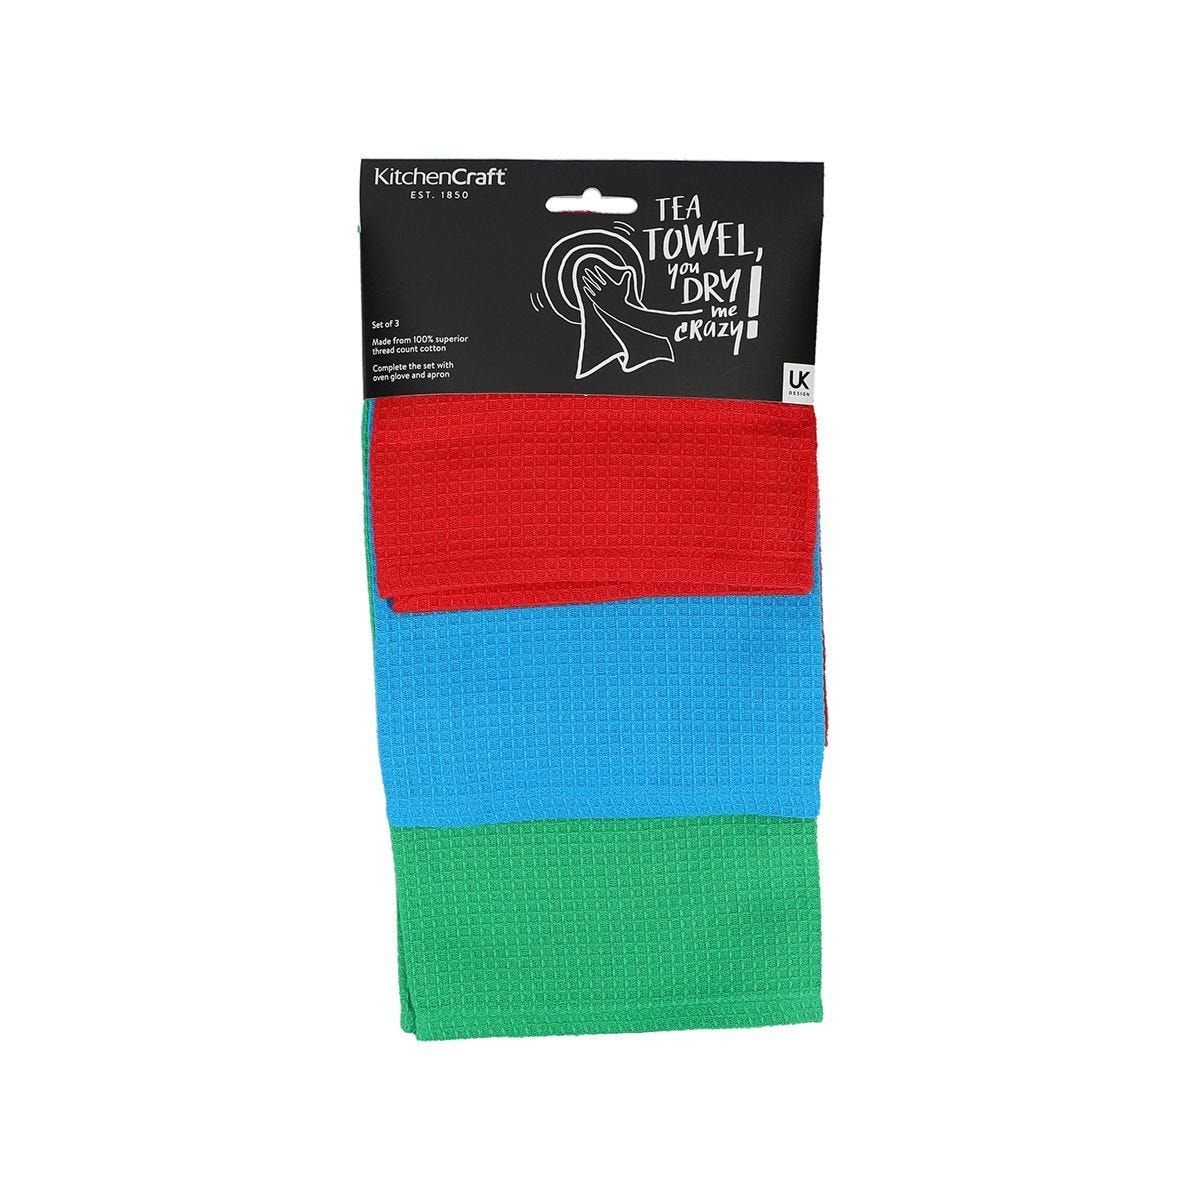 KitchenCraft Set of Three Waffle Tea Towels - Green/Red/Blue